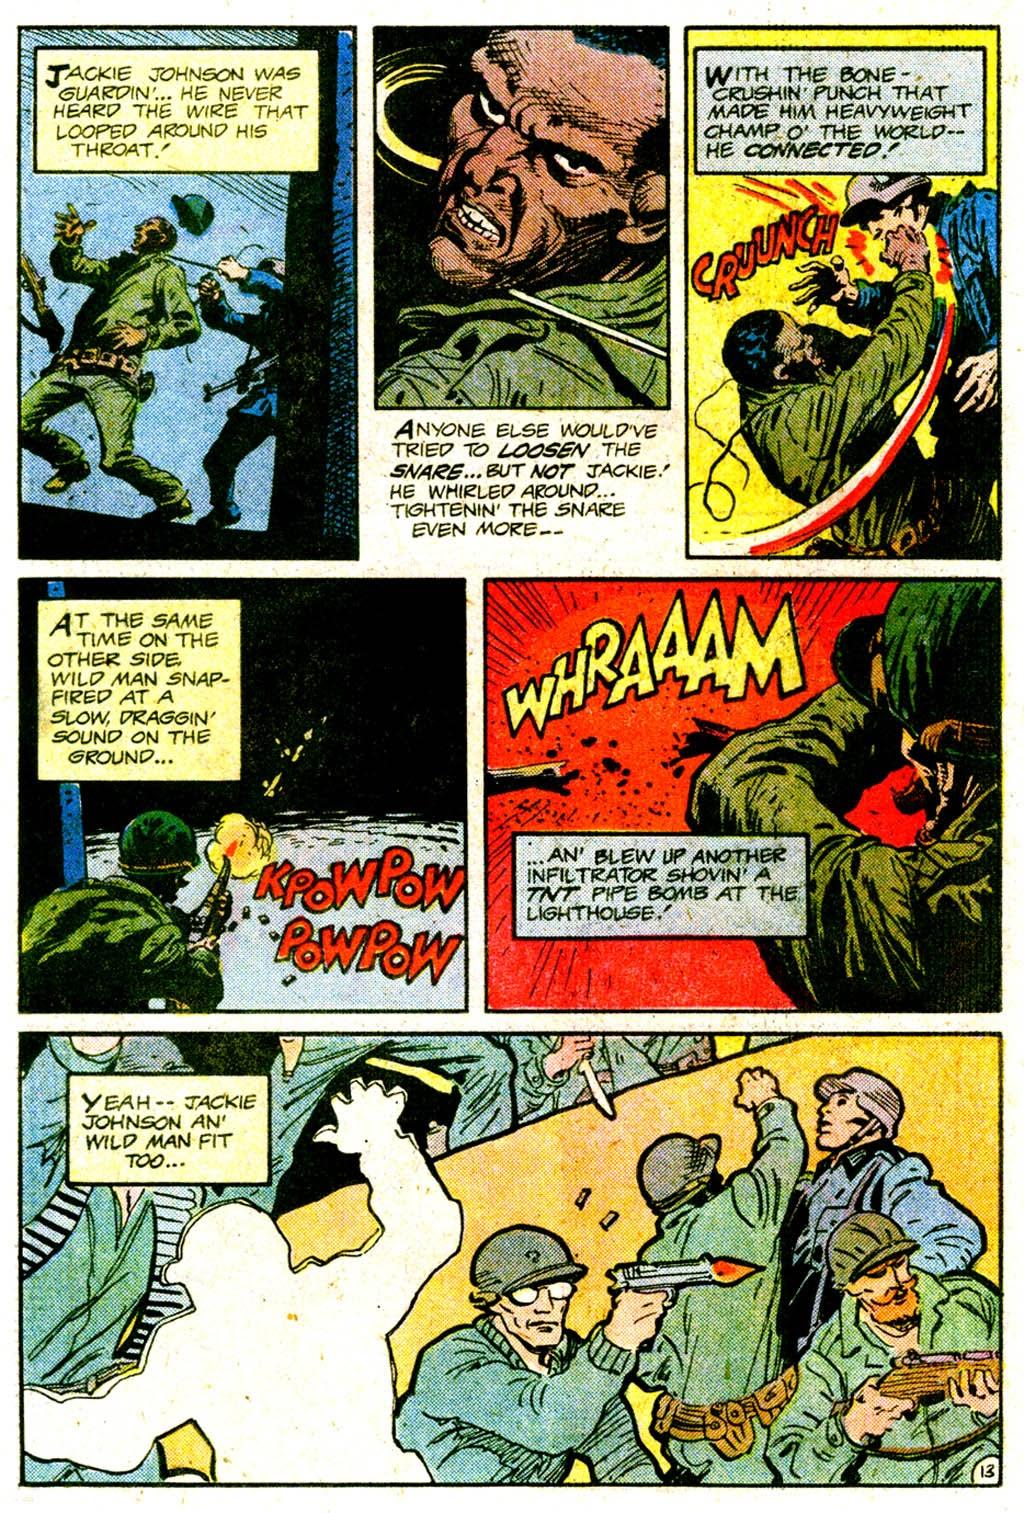 Read online Sgt. Rock comic -  Issue #365 - 17